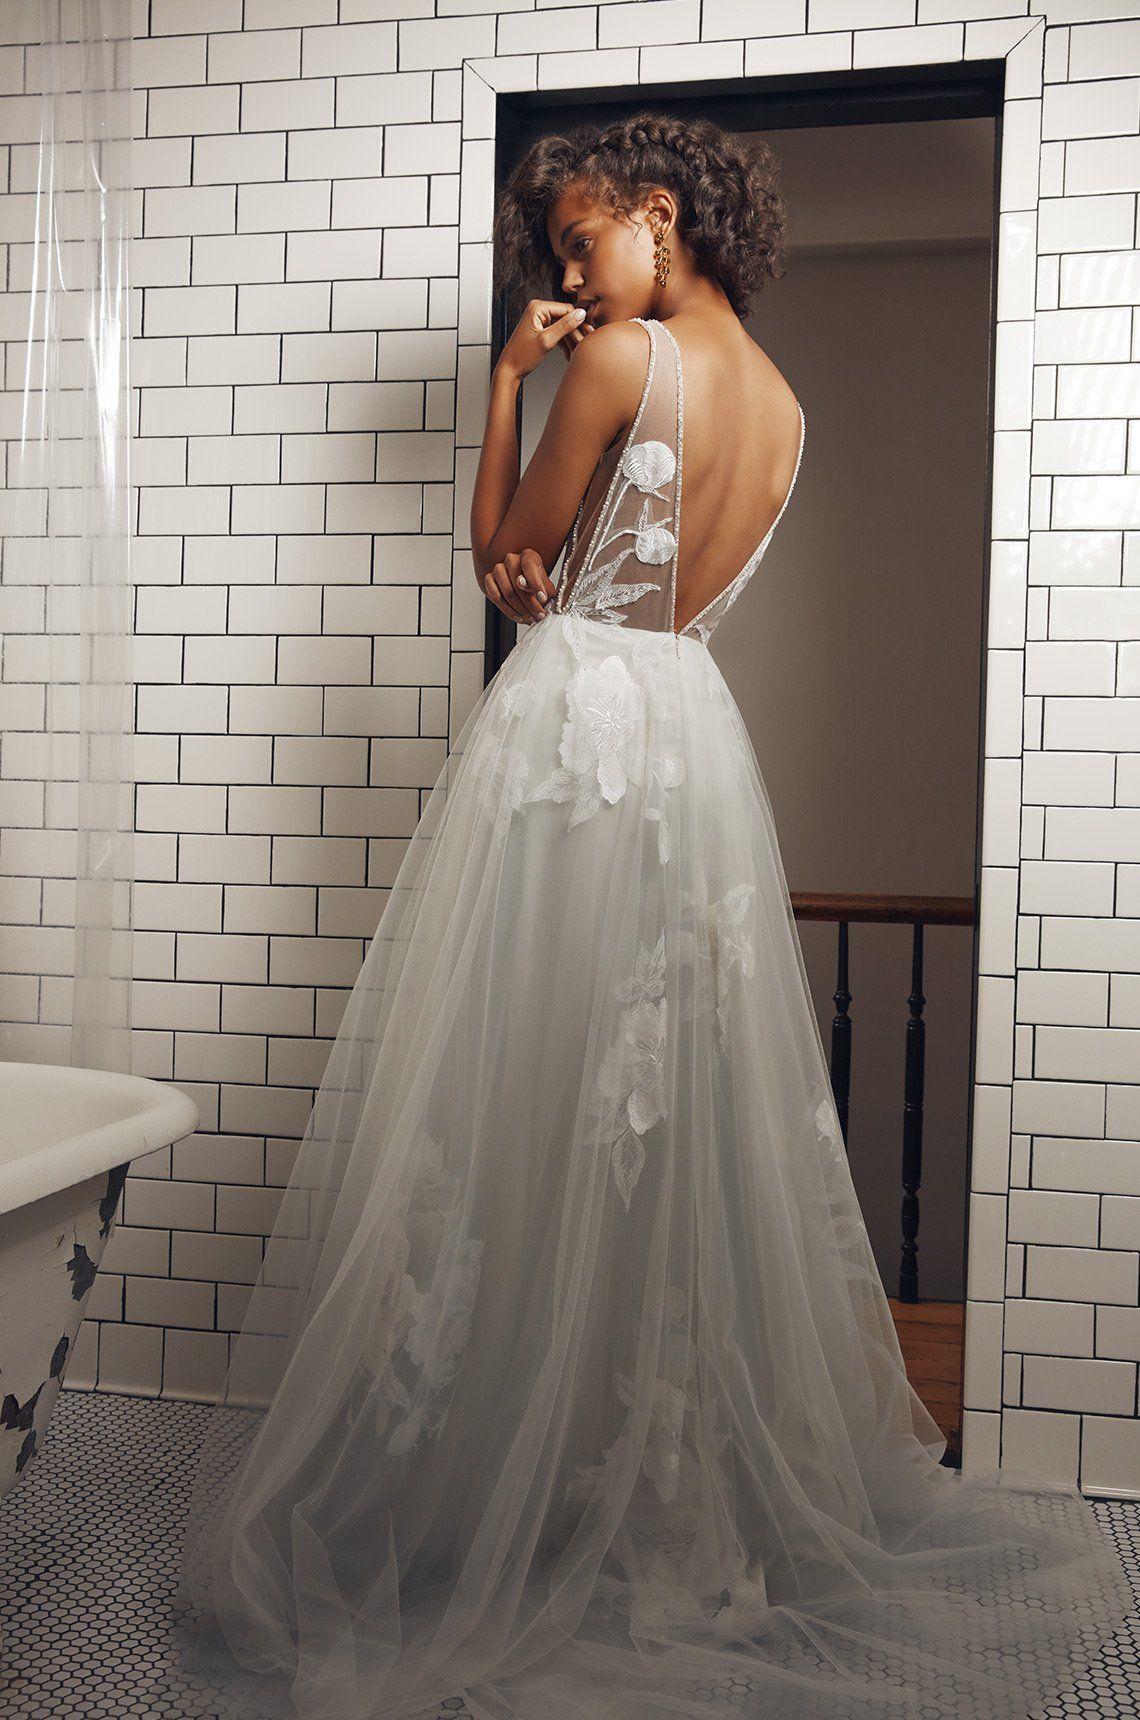 Floravere G O Keeffe Dove Grey Ball Gown Wedding Dress